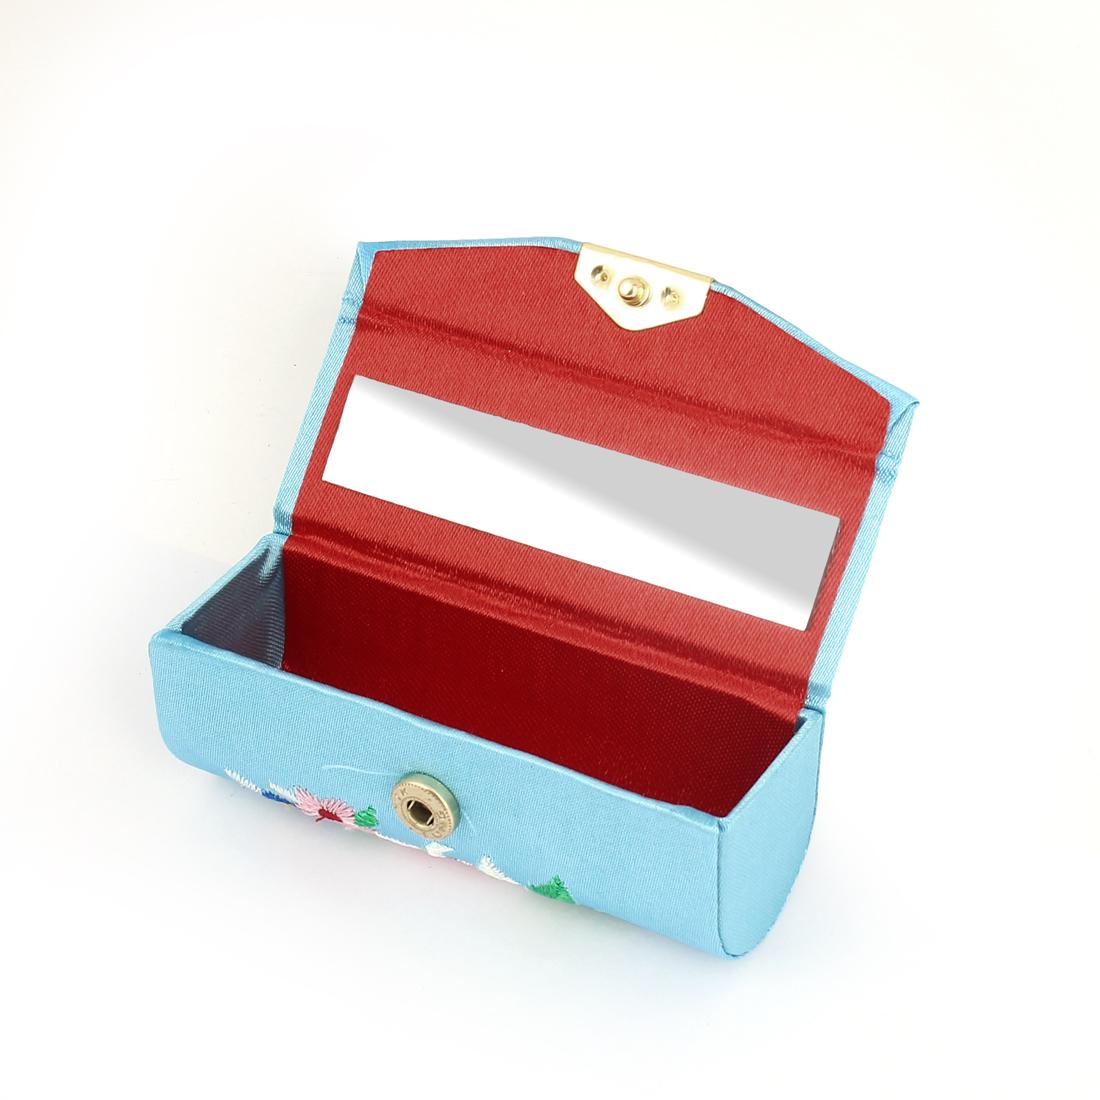 Lady Floral Embroidery Mirror Lipstick Lip Balm Chap Stick Case Box Holder Blue - image 1 de 2